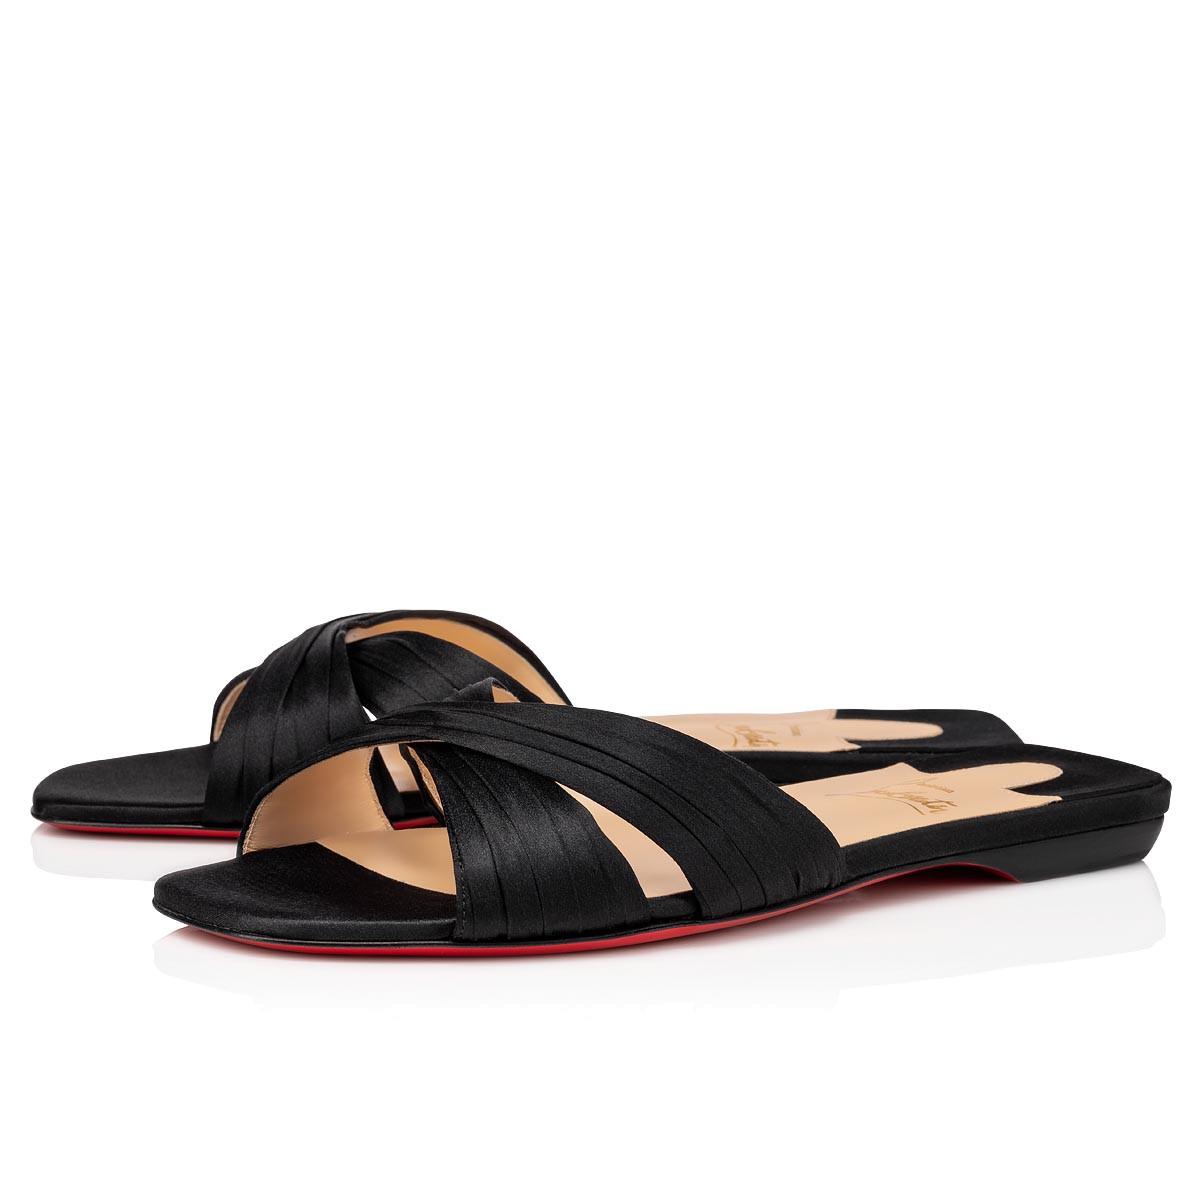 Shoes - Nicol Is Back Flat - Christian Louboutin